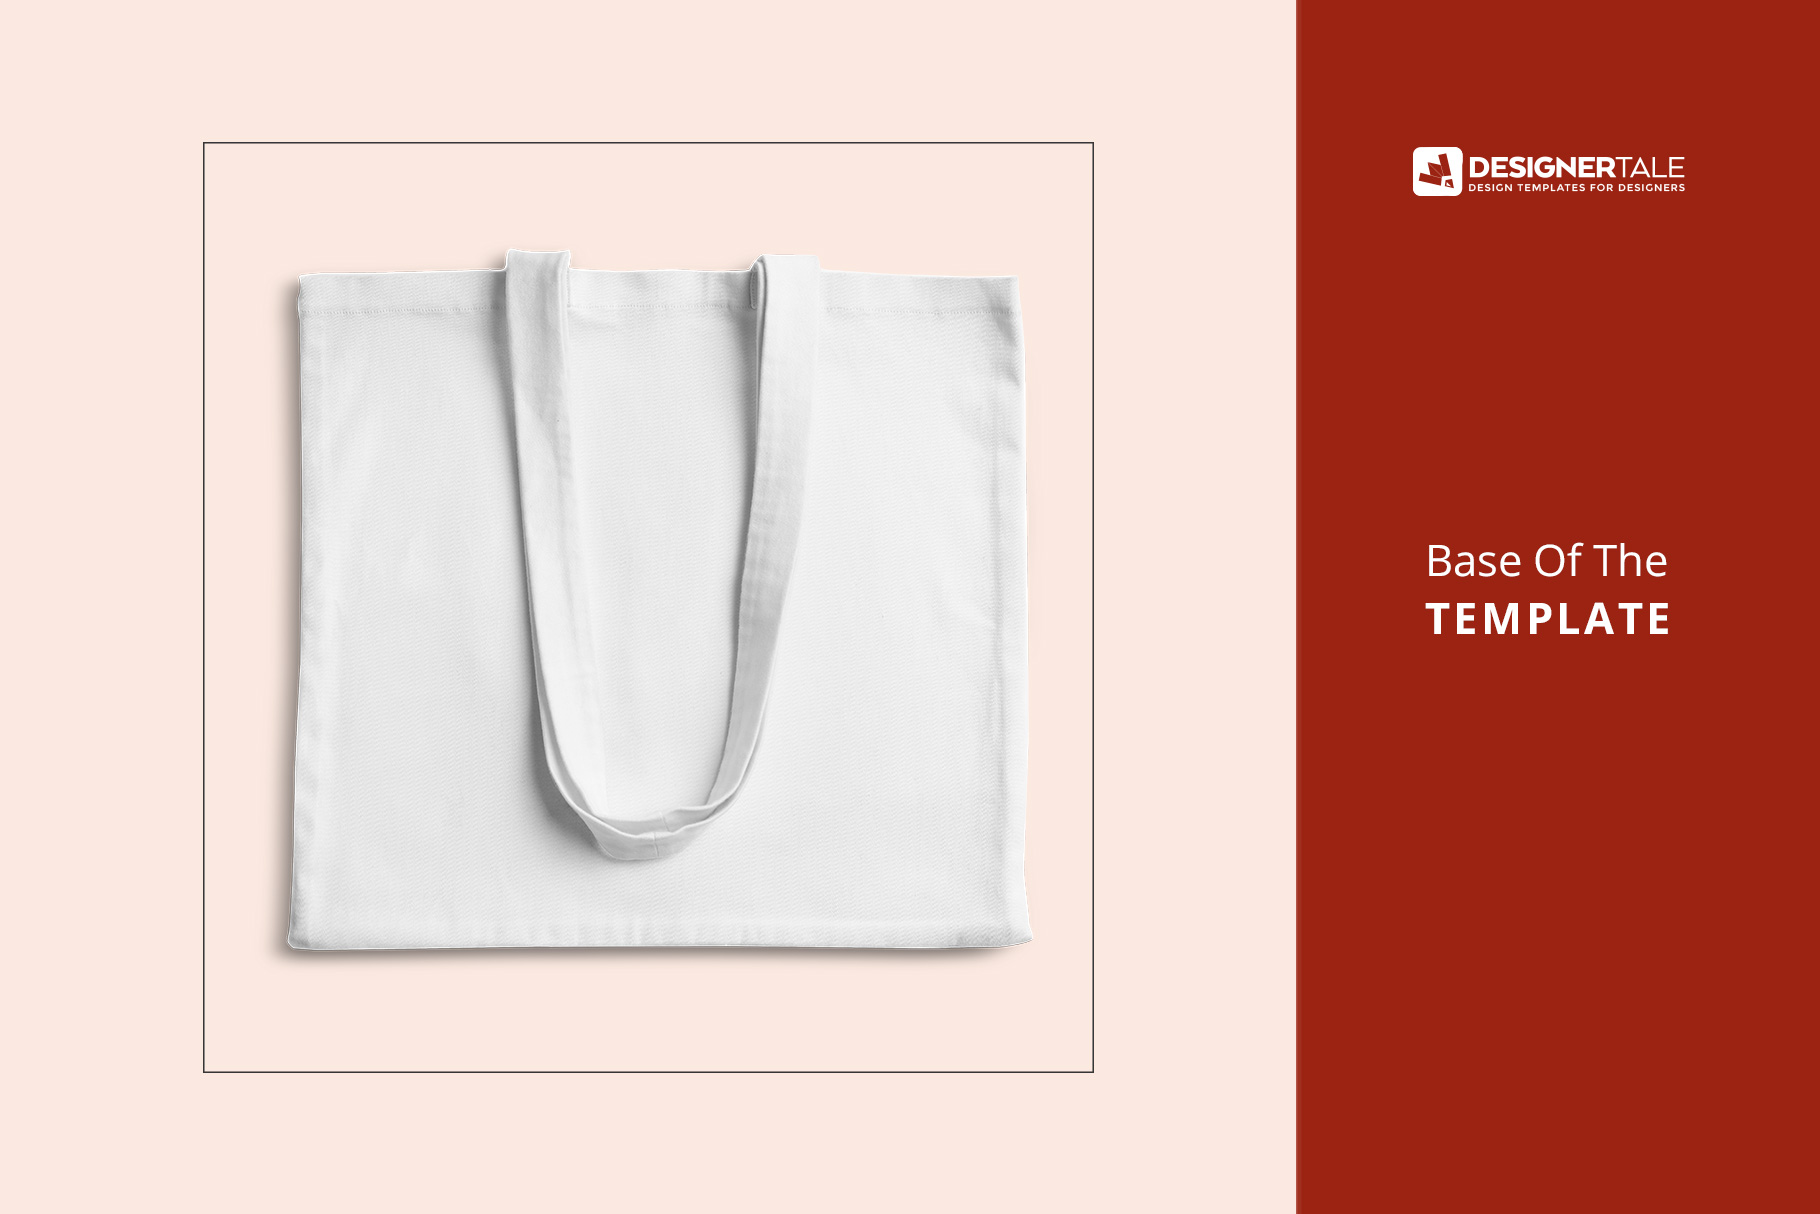 base image of the top view reusable cotton tote bag mockup